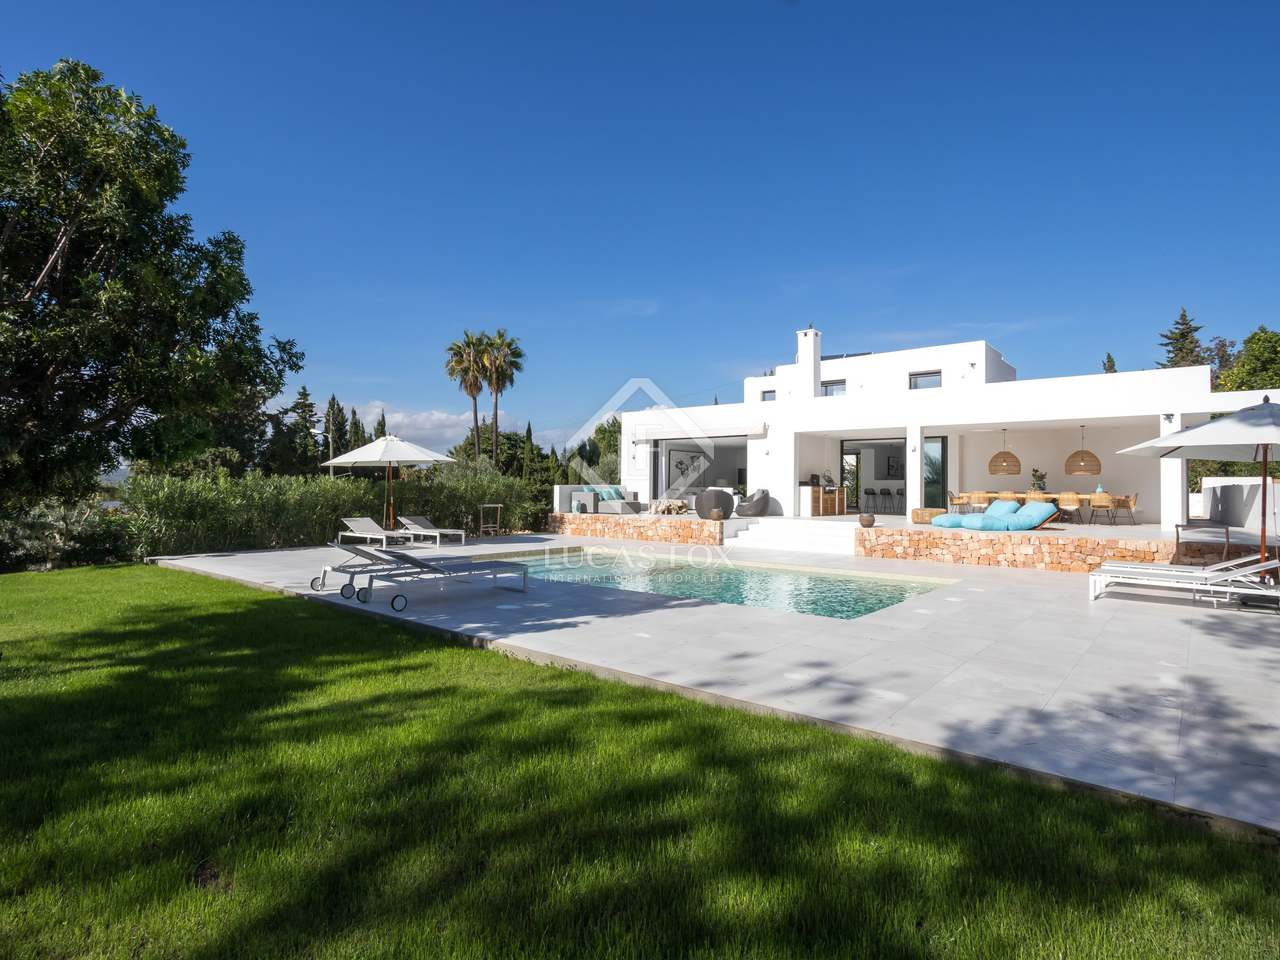 Huis villa van 230m te koop met 800m tuin in ibiza town for Huis te koop borgerhout met tuin